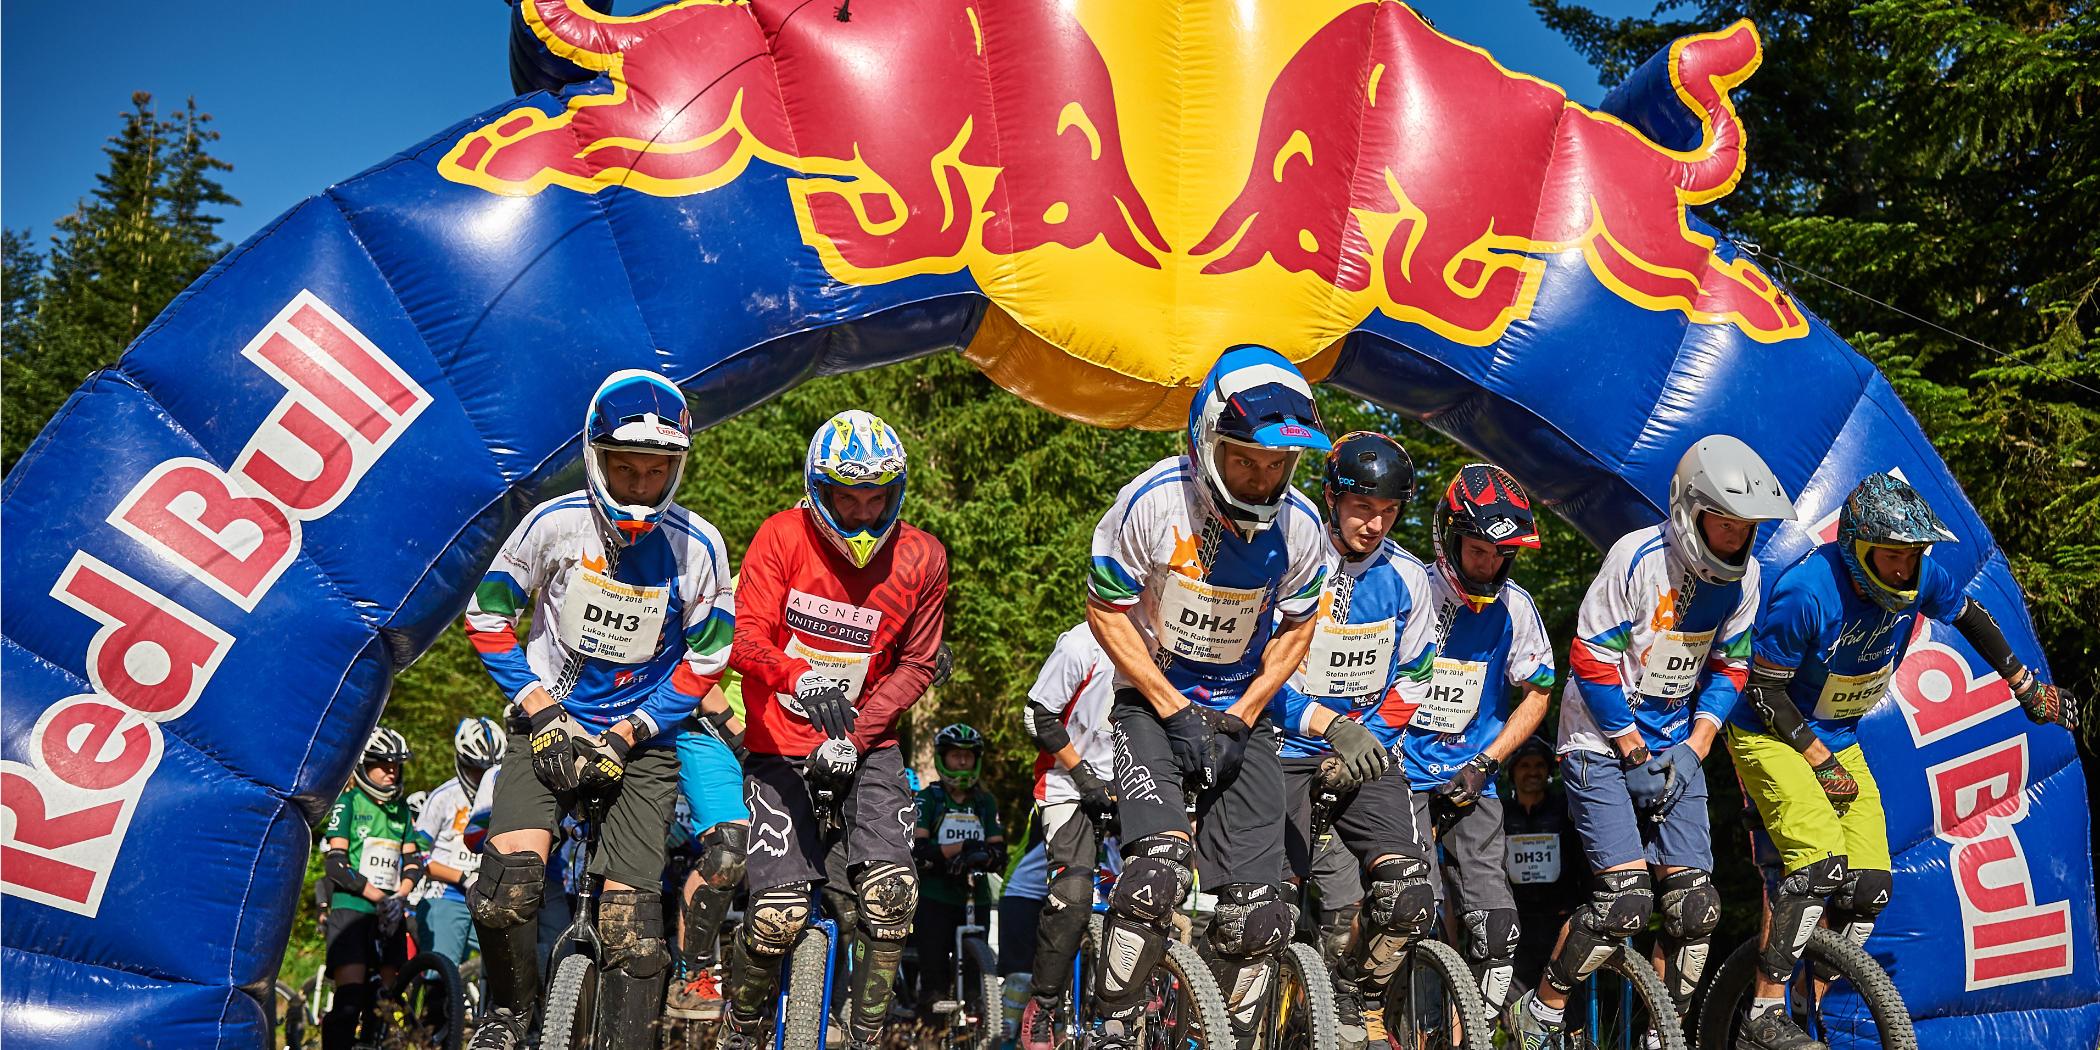 Salzkammergut Trophy - Einrad-Downhill Start (Foto: Martin Bihounek)